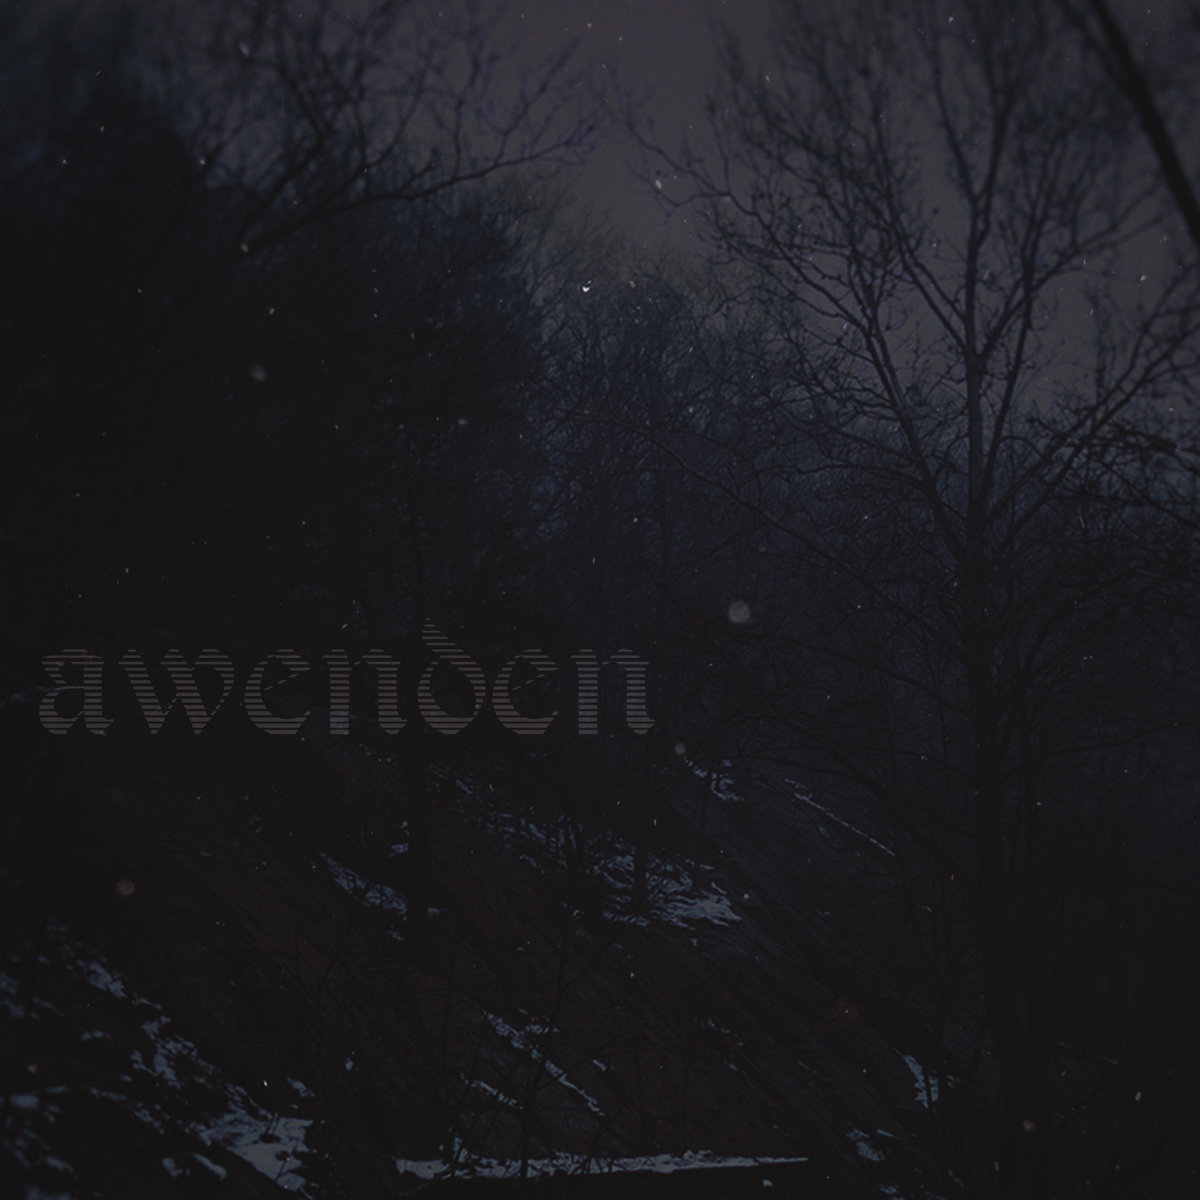 https://awendan.bandcamp.com/releases